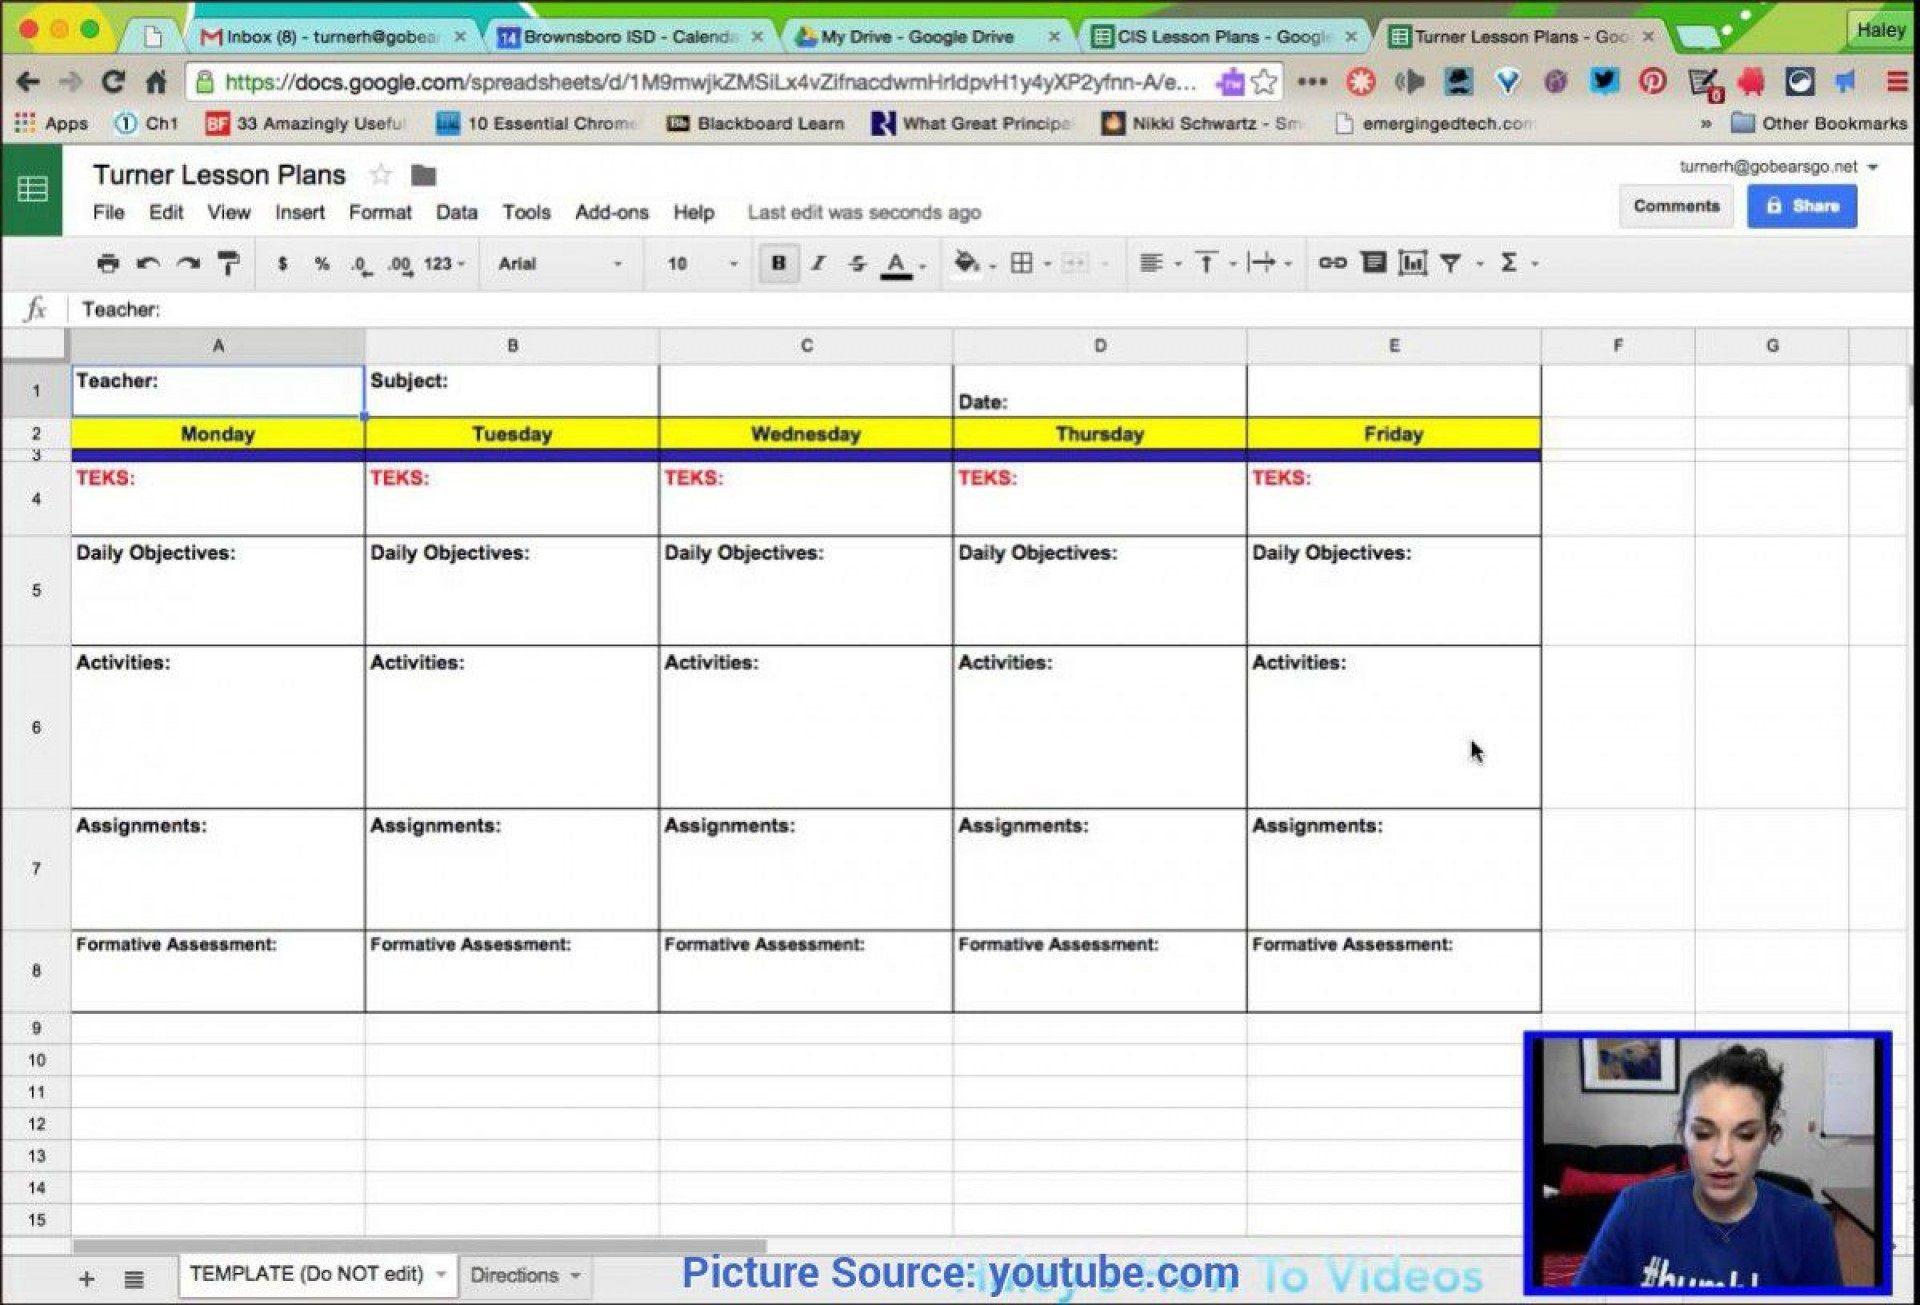 004 Surprising Lesson Plan Template Google Doc Highest Quality  Docs Danielson Siop High School1920